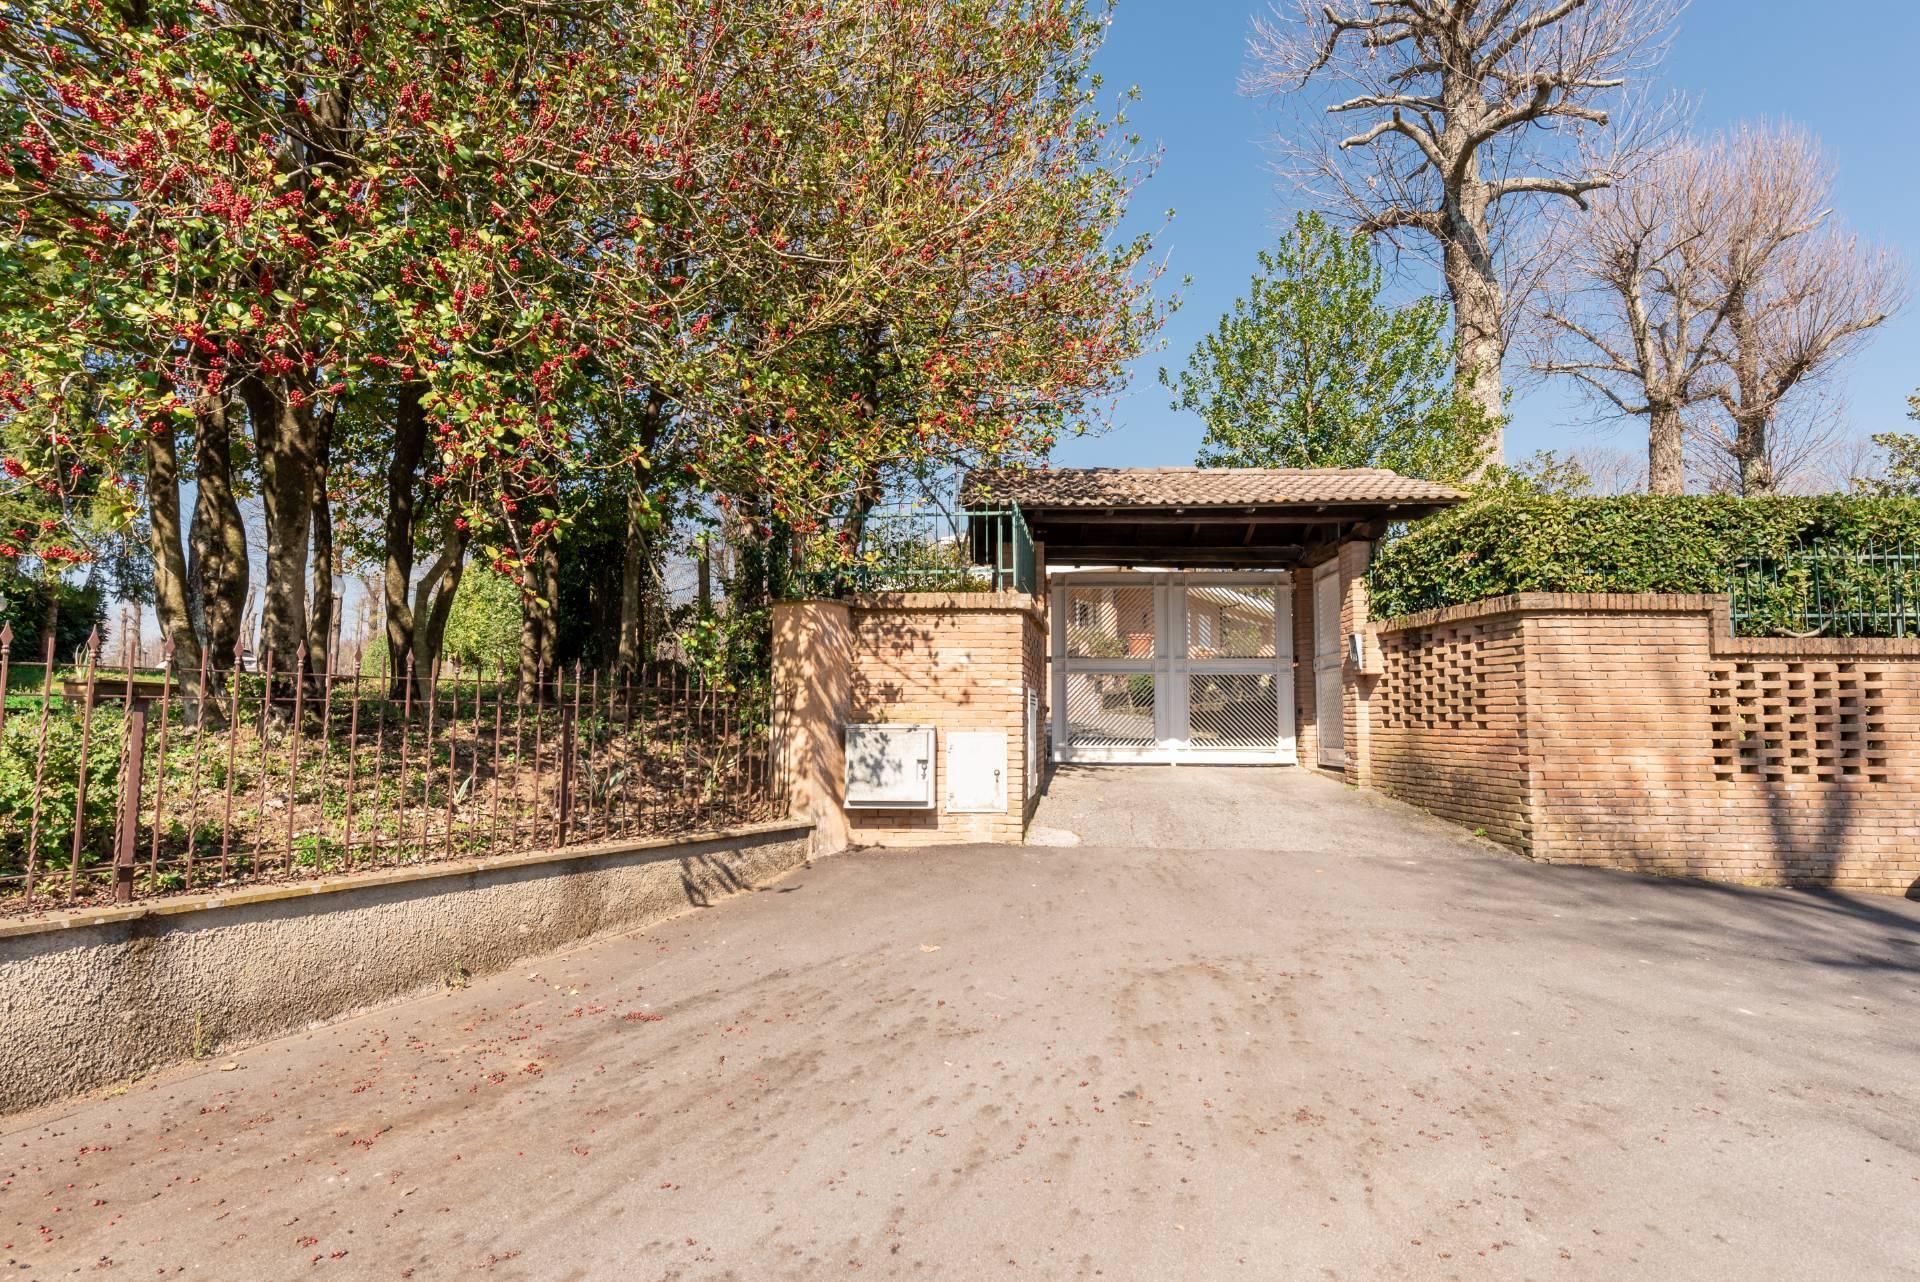 Villa in Vendita a Ariccia: 5 locali, 583 mq - Foto 30